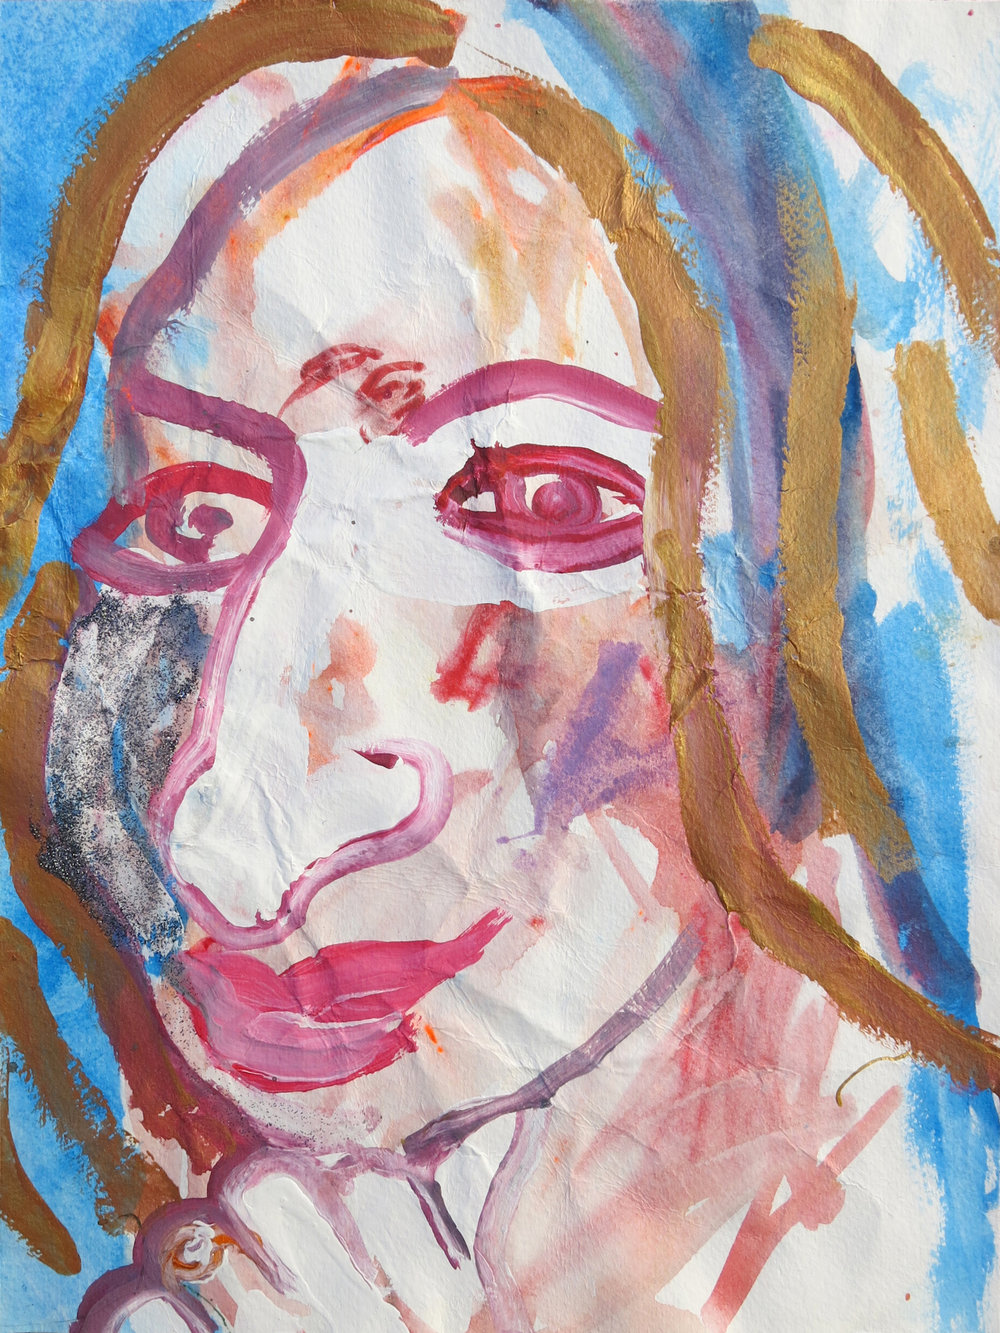 Barbra Streisand Portrait #49